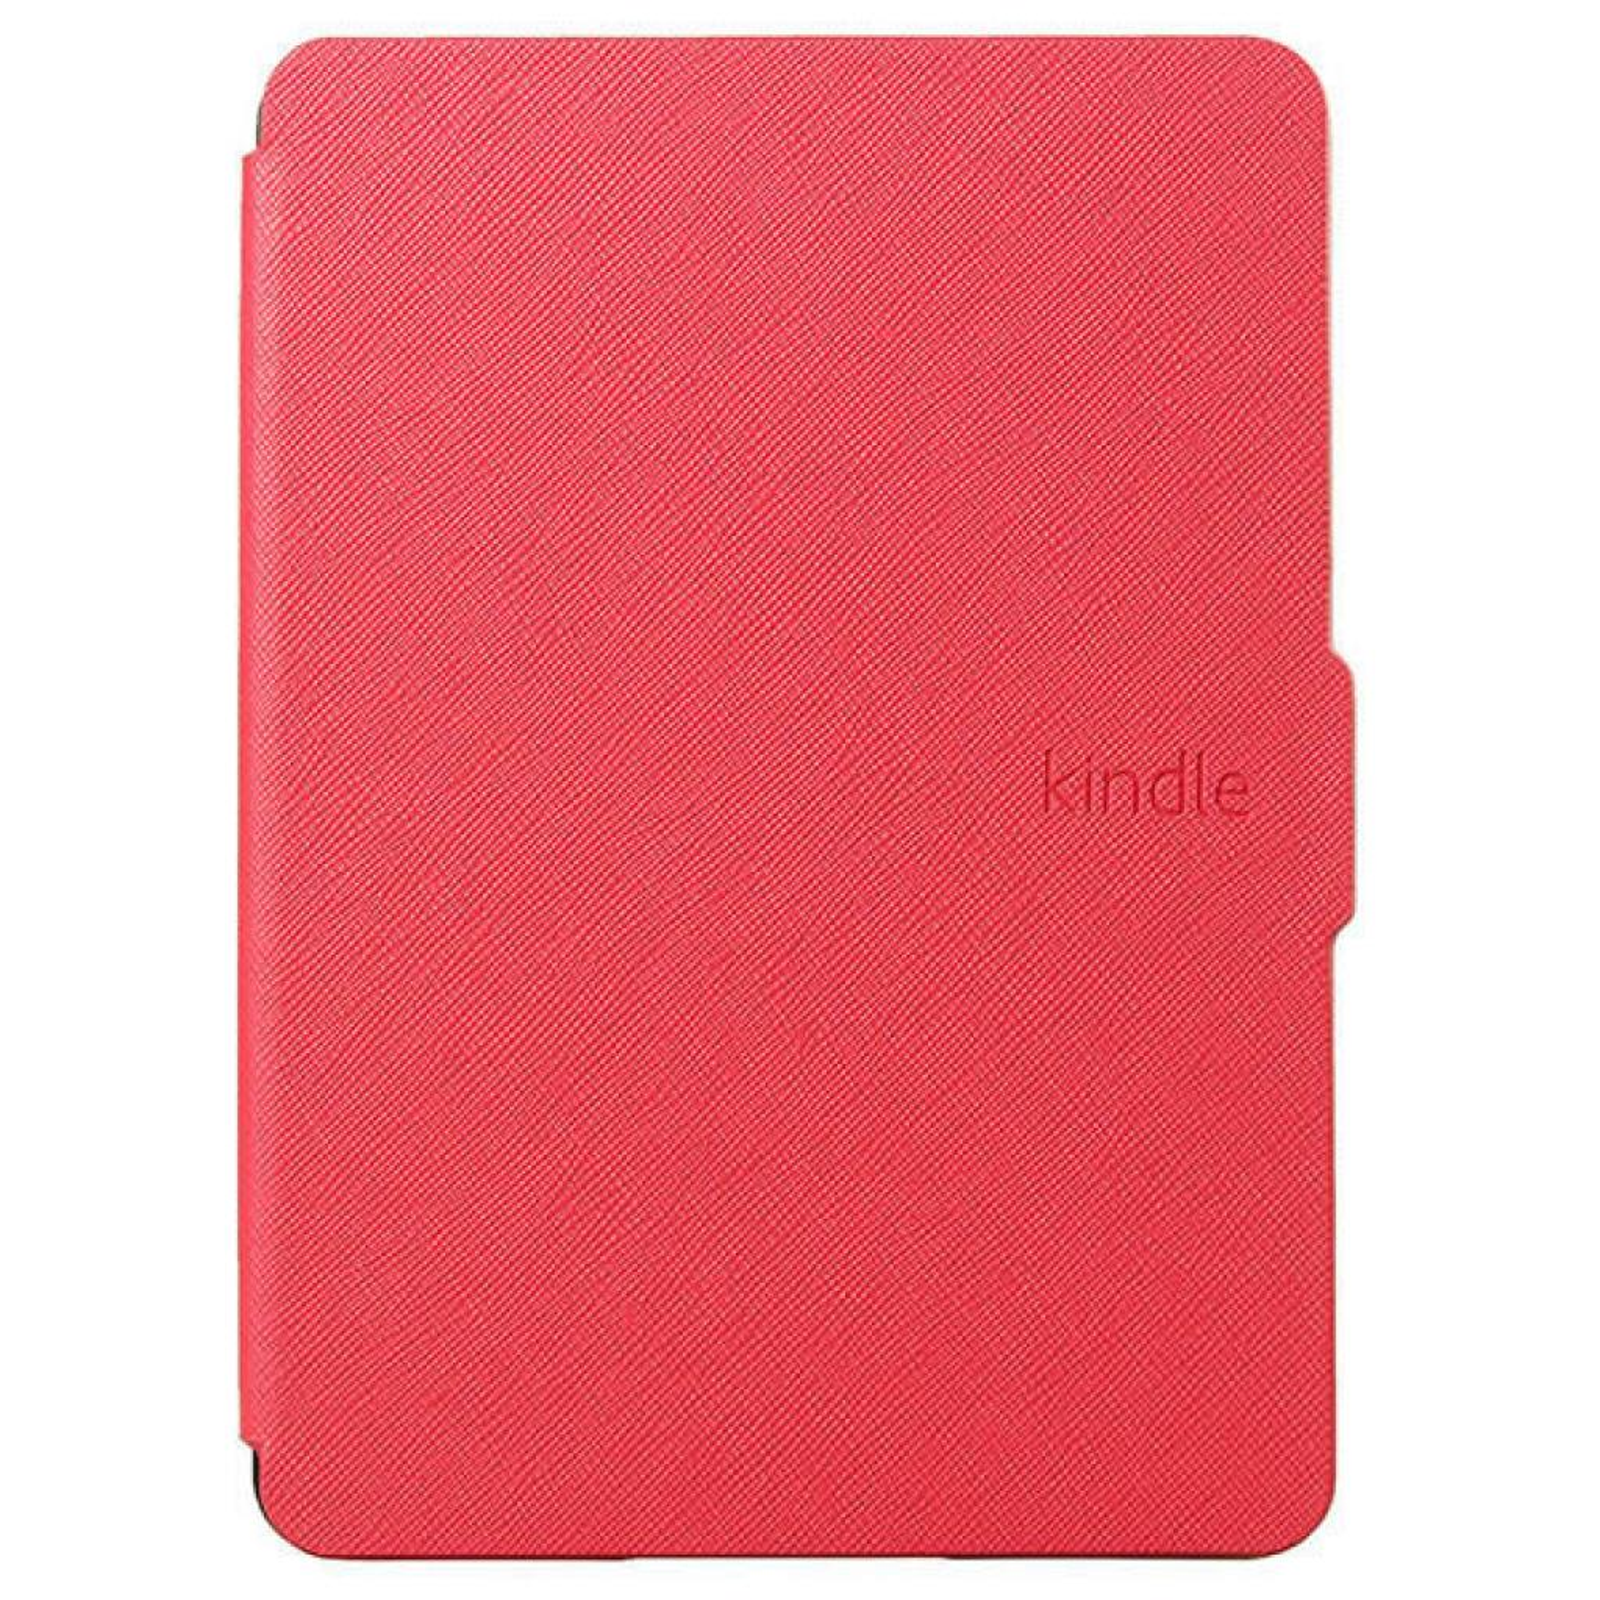 Чехол для электронной книги AirOn для Amazon Kindle 6 red (4822356754499)